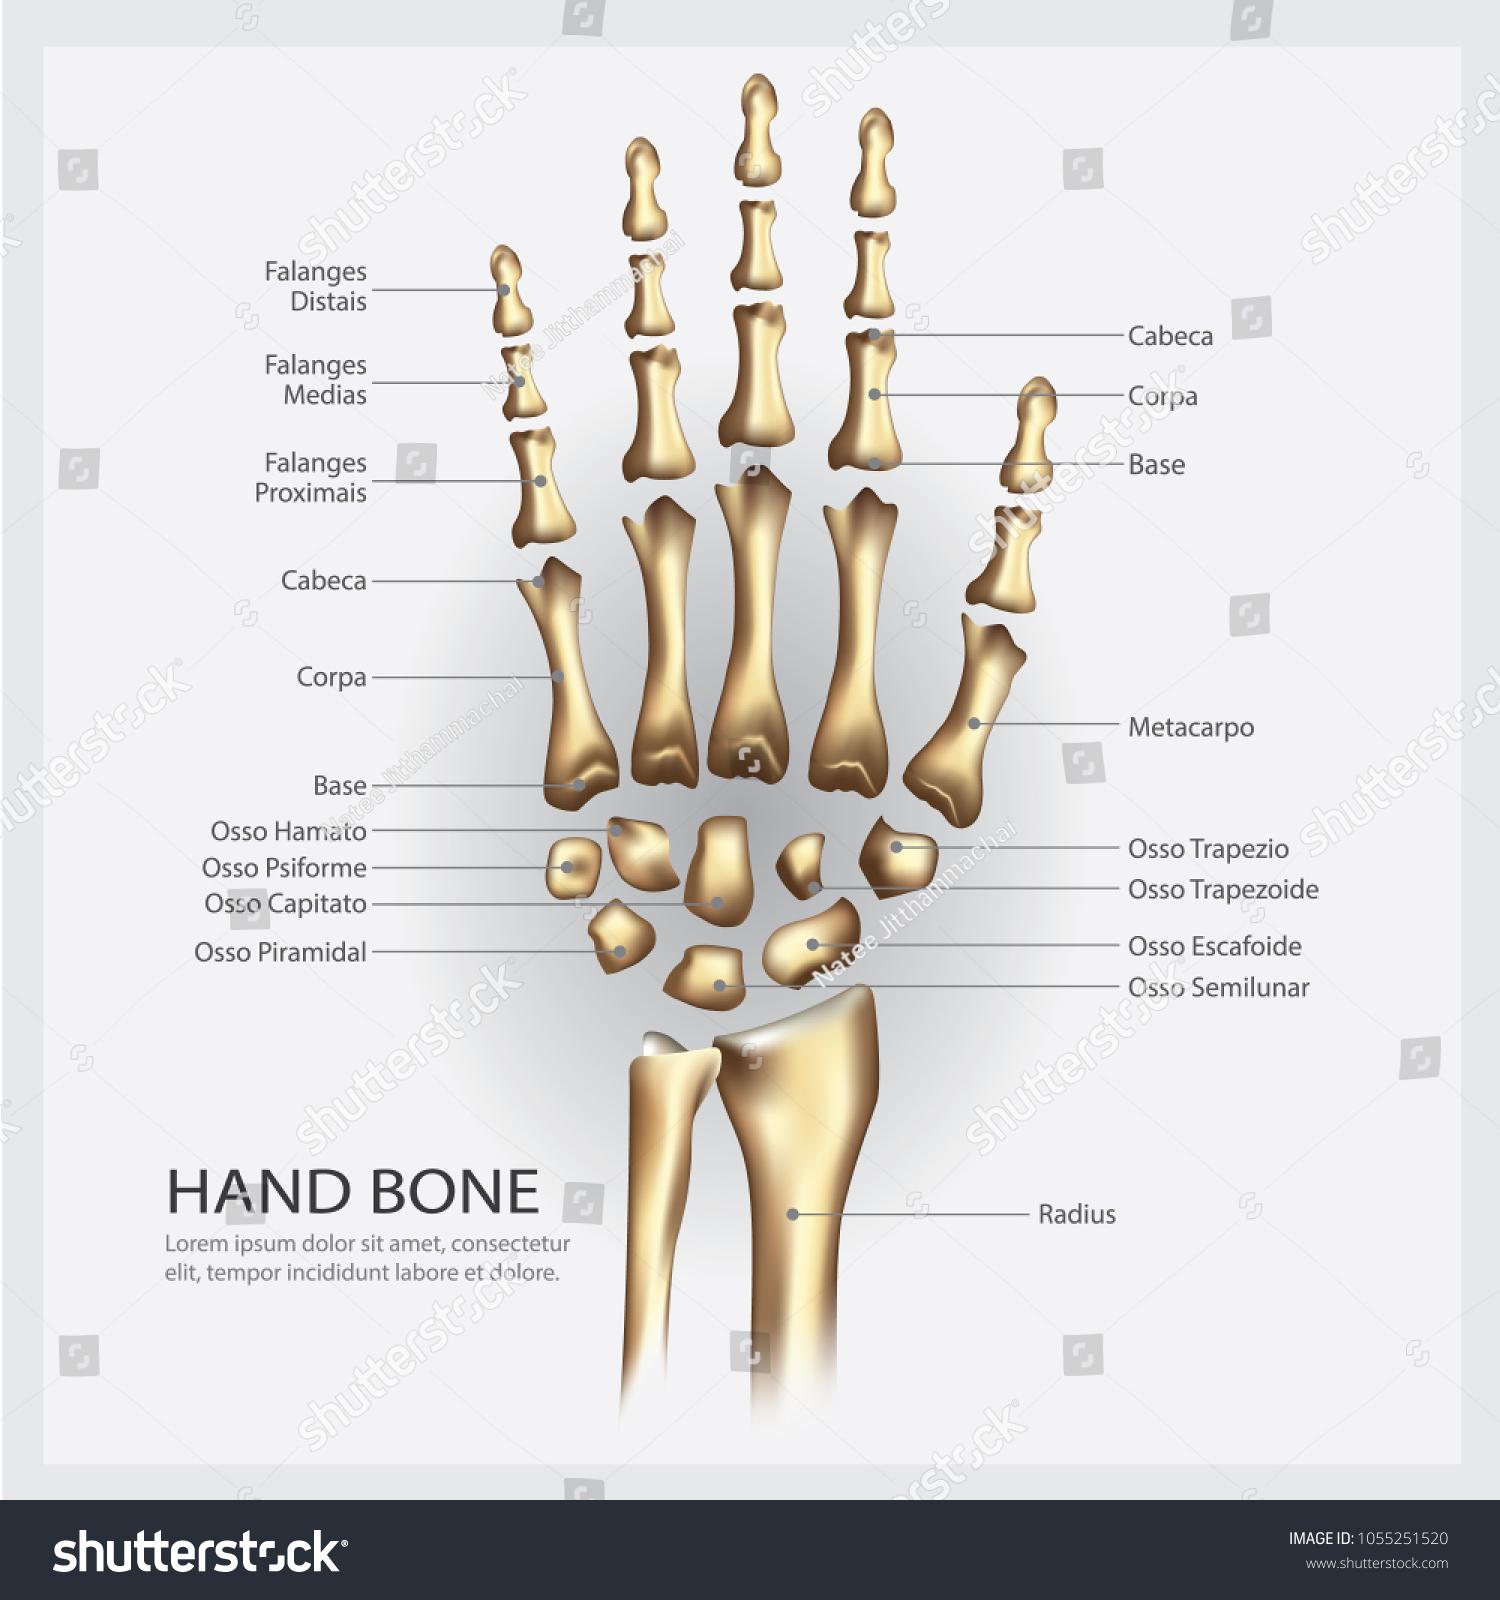 Hand Bone Anatomy Detail Vector Illustration Stock Vector (Royalty ...